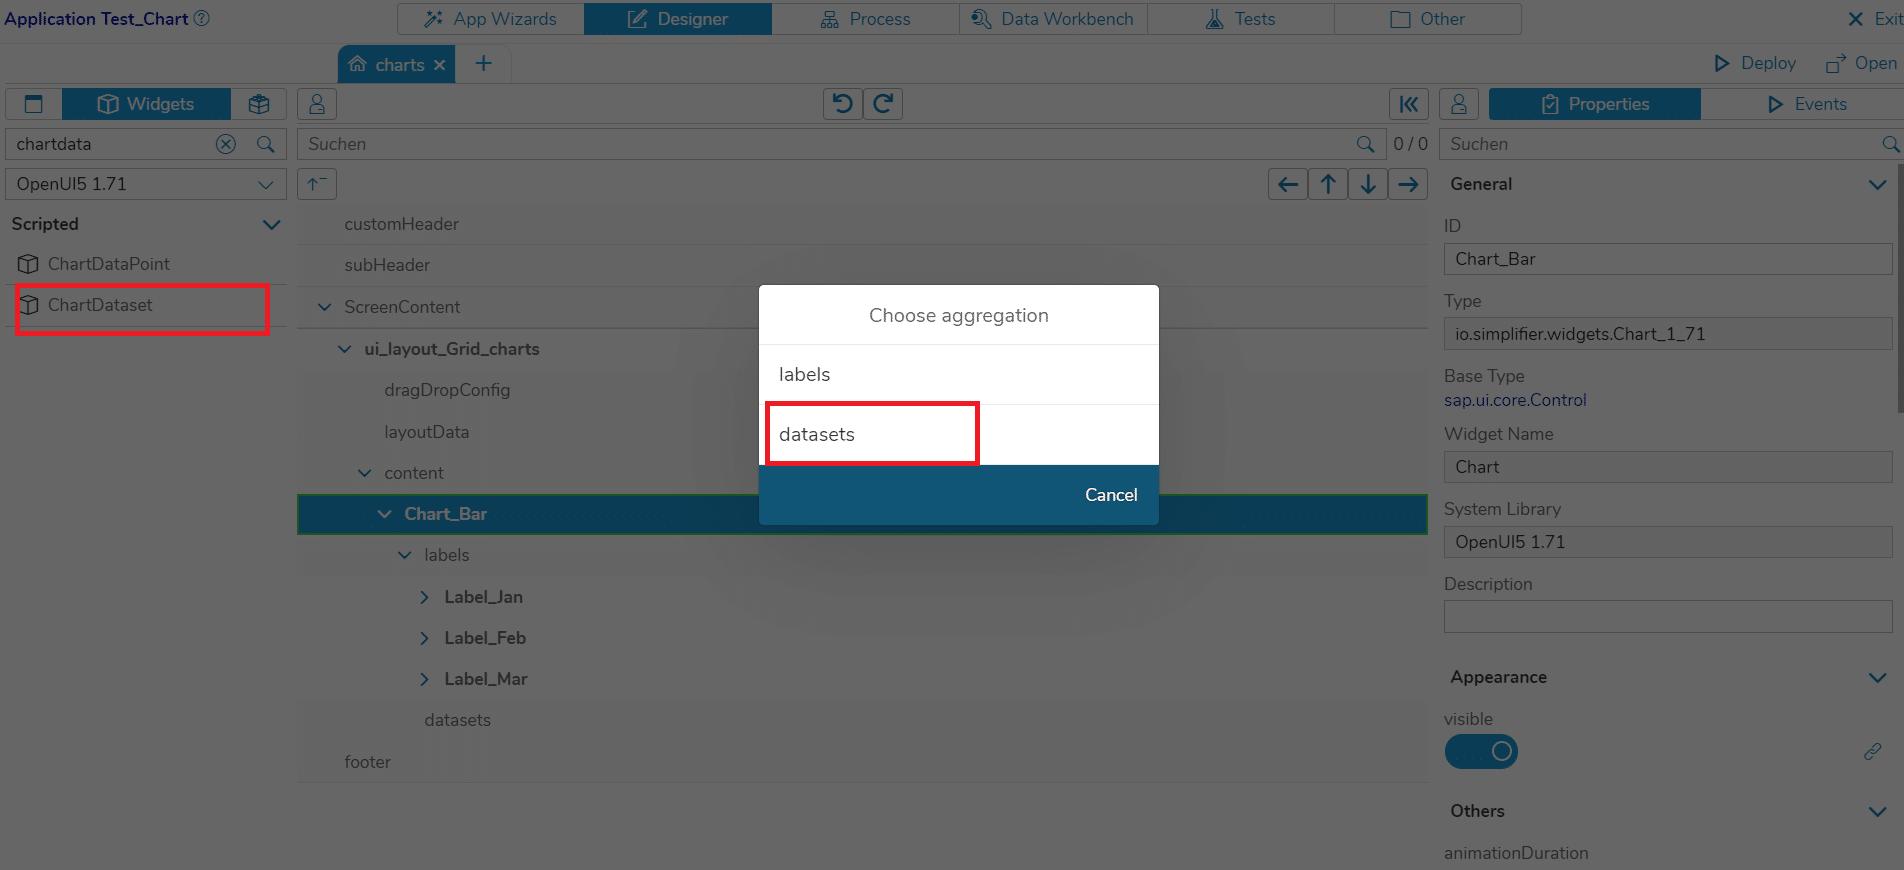 Select 'datasets' as aggregation